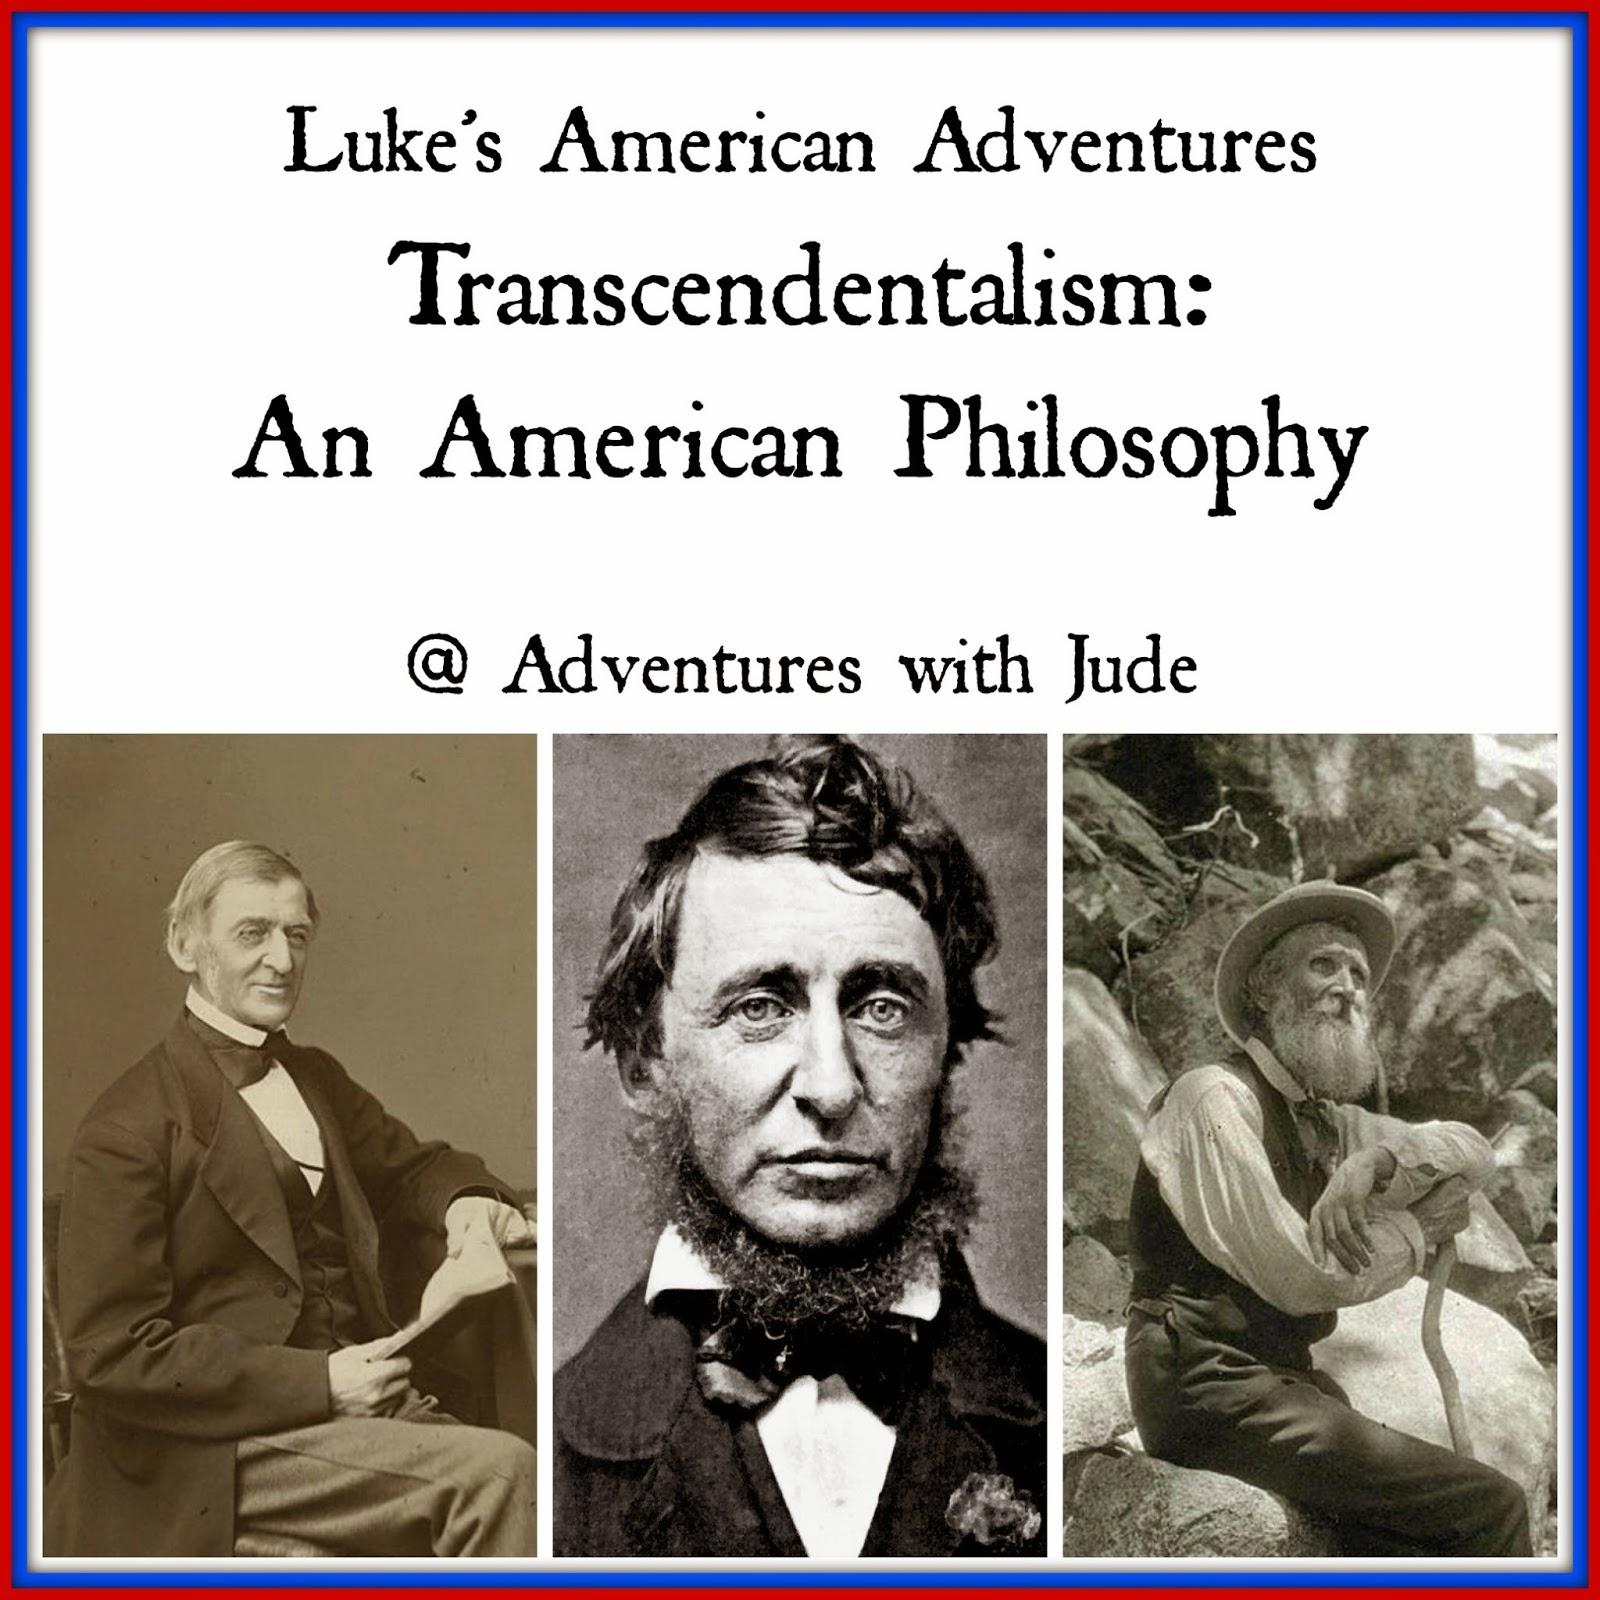 Luke's American Adventures Trancenscendentalism: An American Philosophy